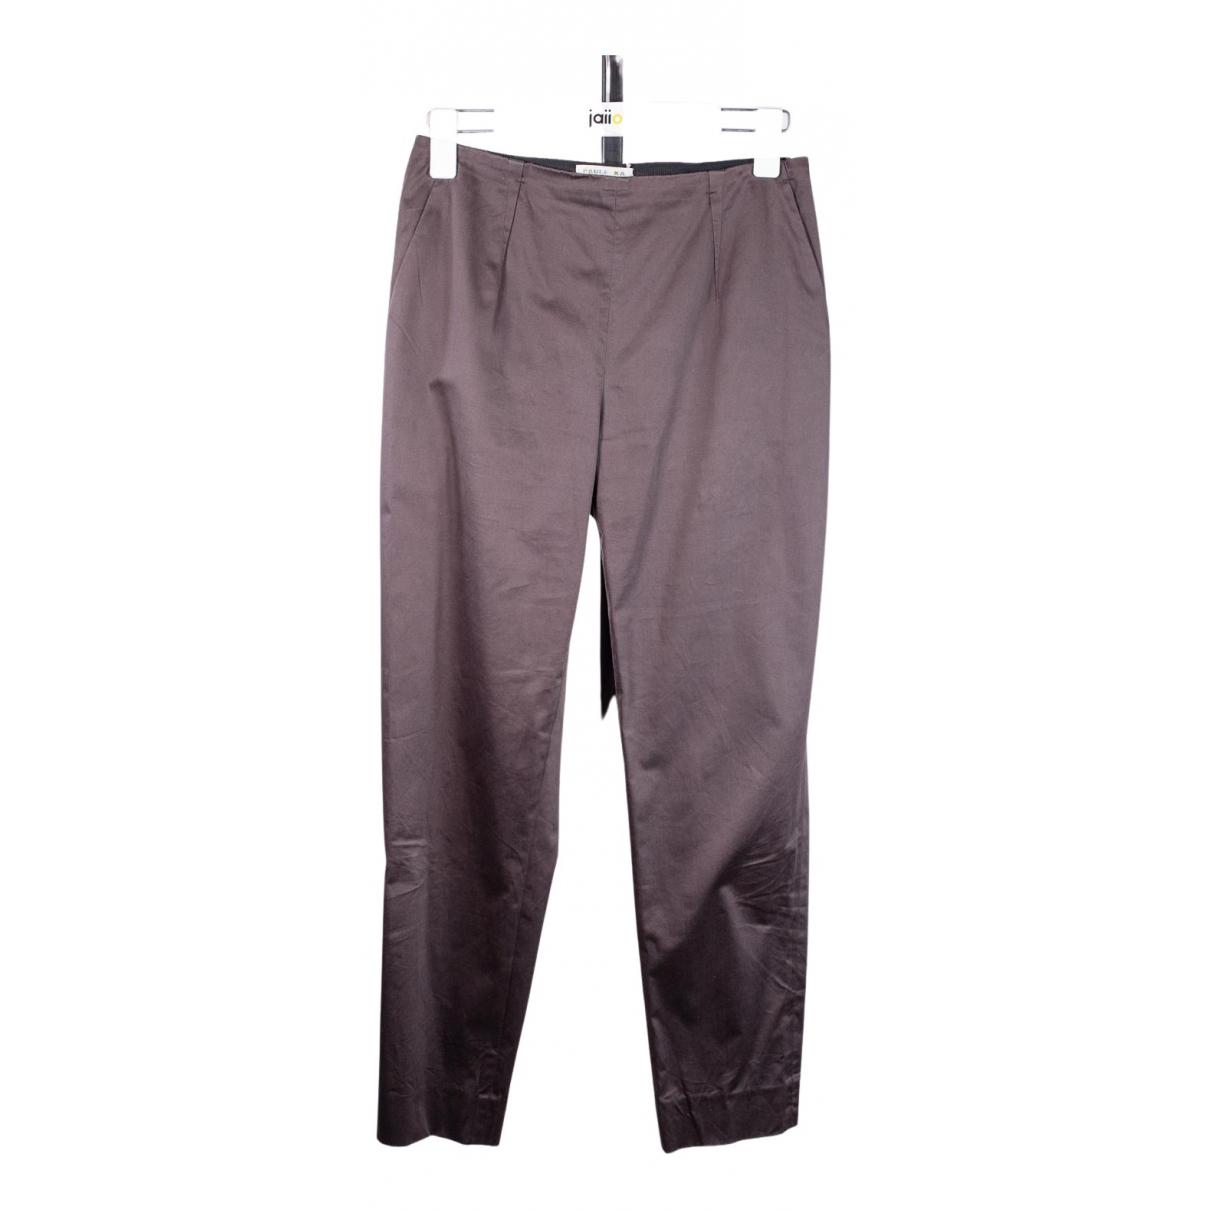 Paule Ka N Brown Cotton Trousers for Women 38 FR